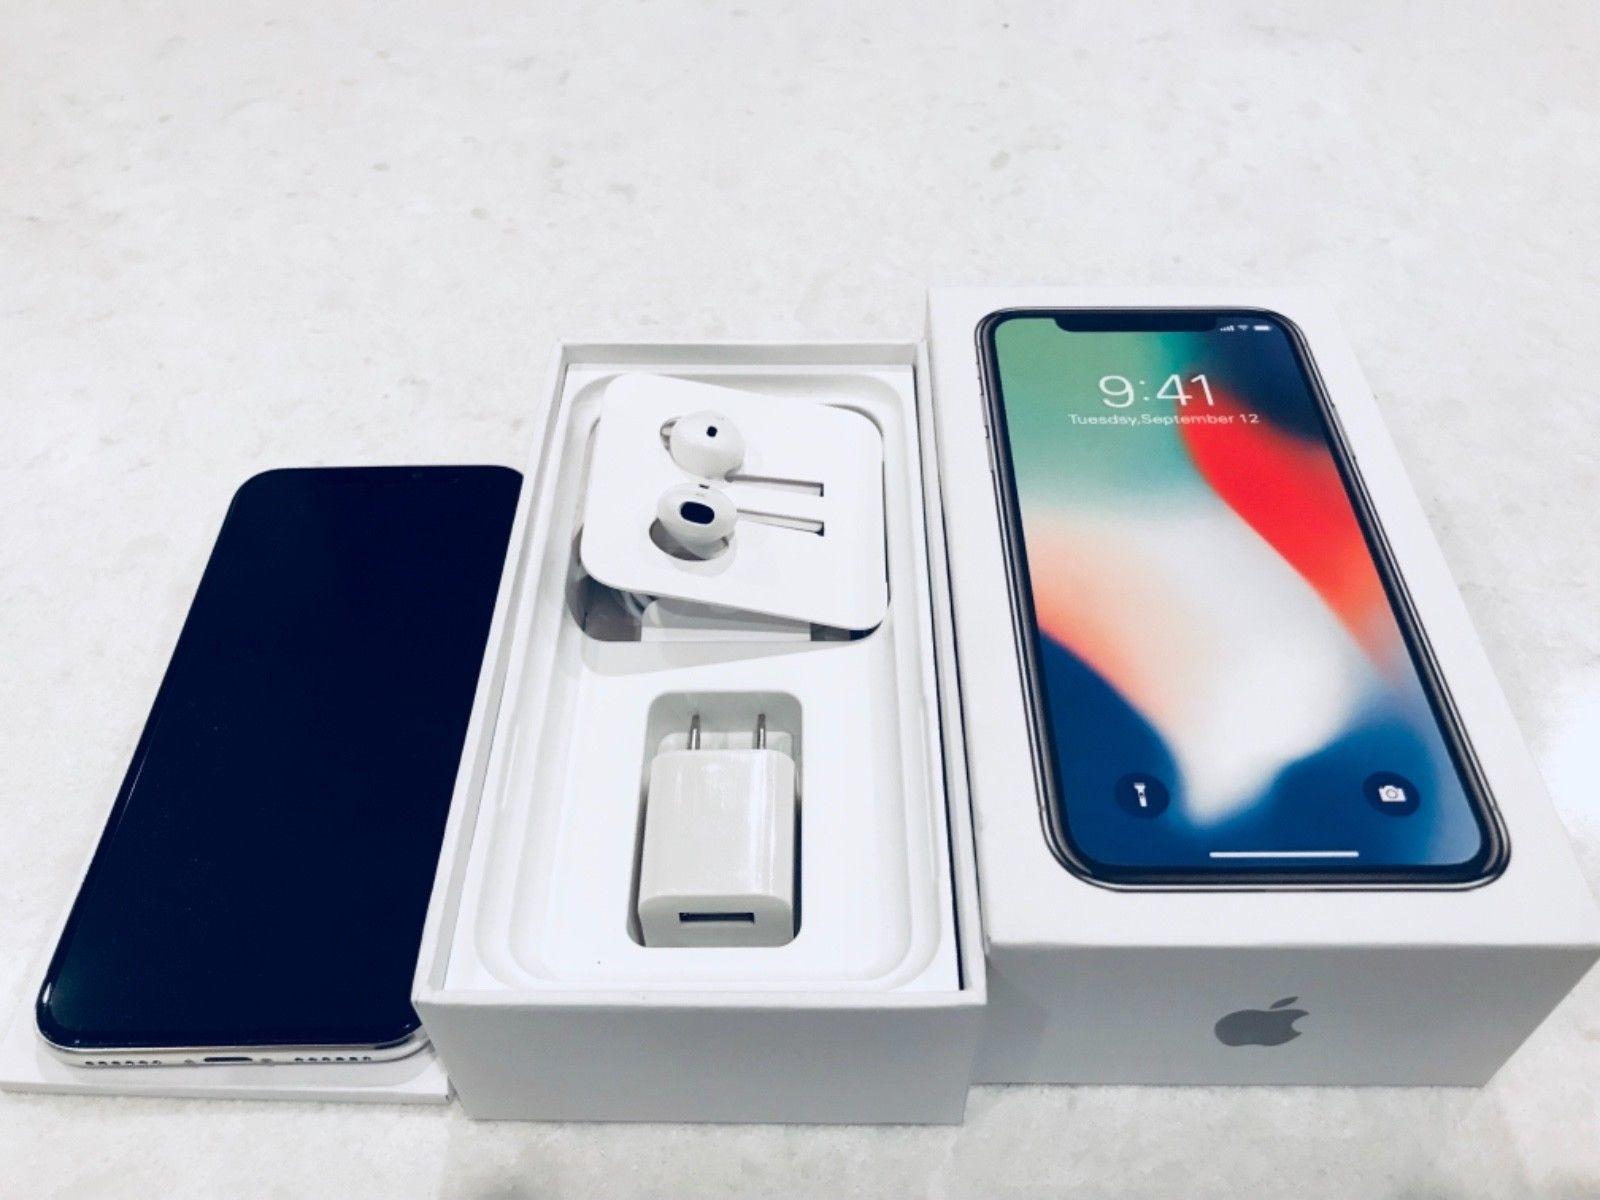 Wholesale Price Buy : iPhone x, Note 8, S8 Plus, iPhone 8 PlusComputers and MobilesMobile PhonesFaridabadBallabhgarh